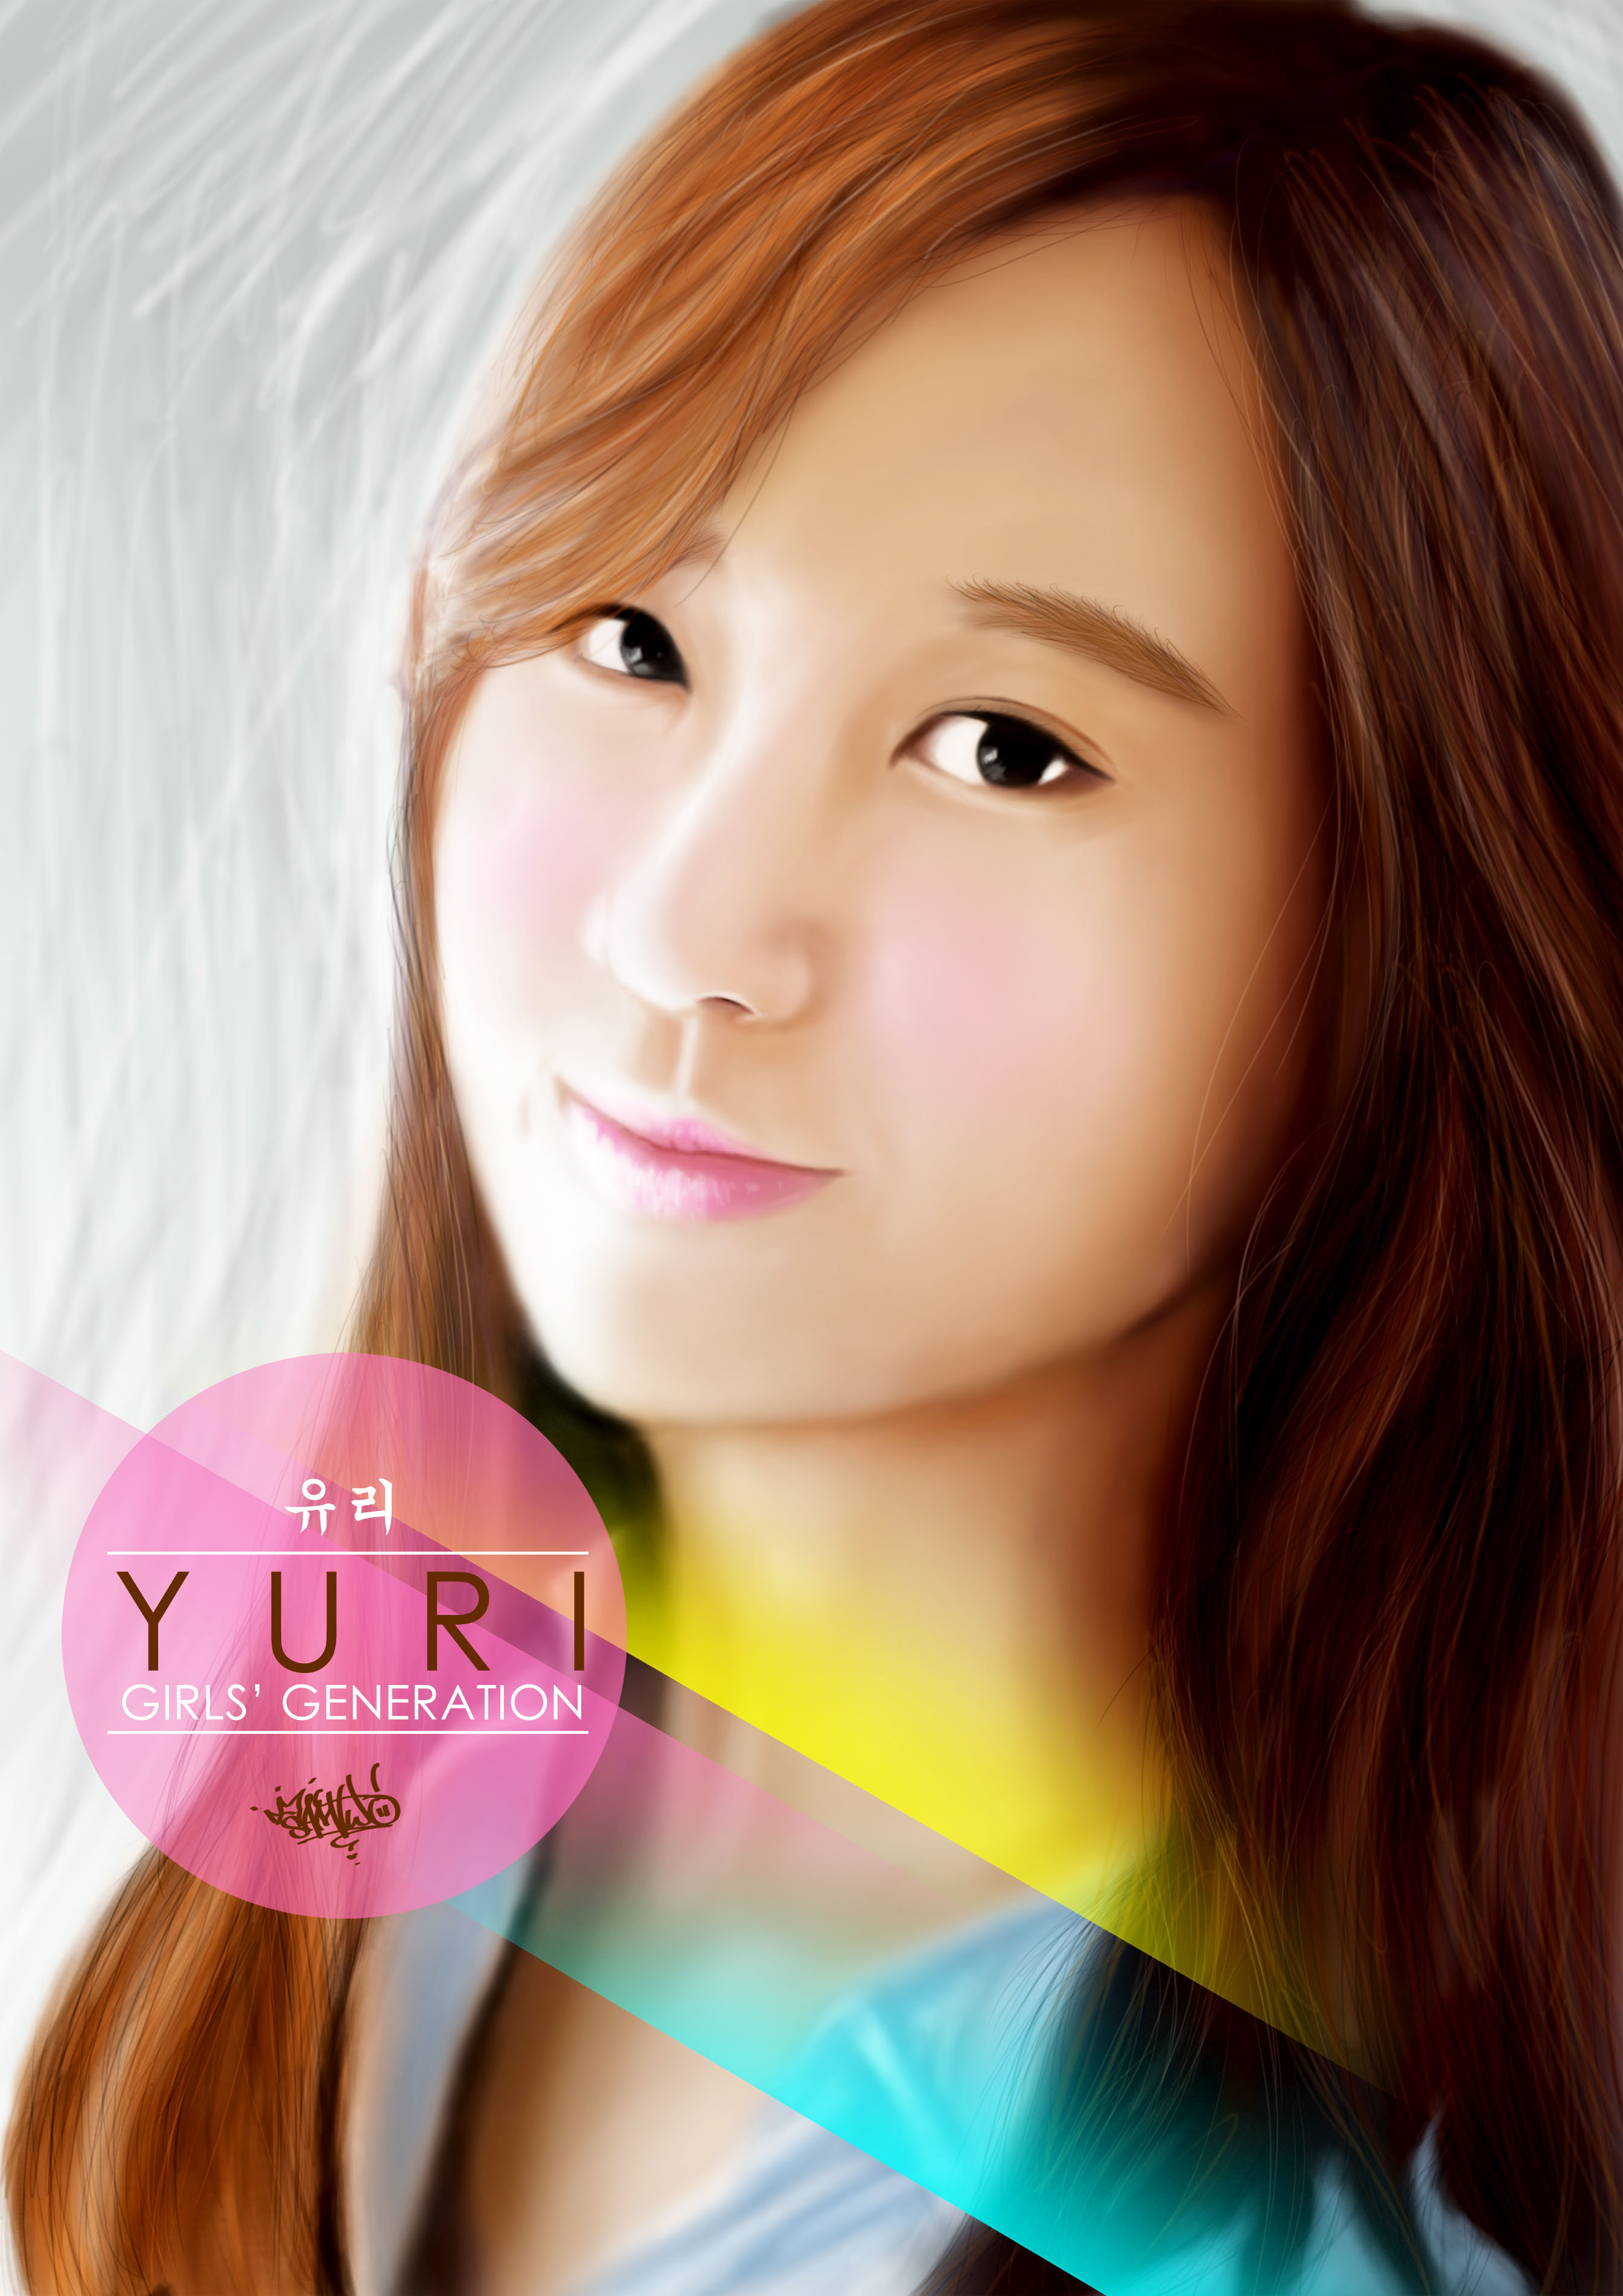 رسومات snsd Yuri1